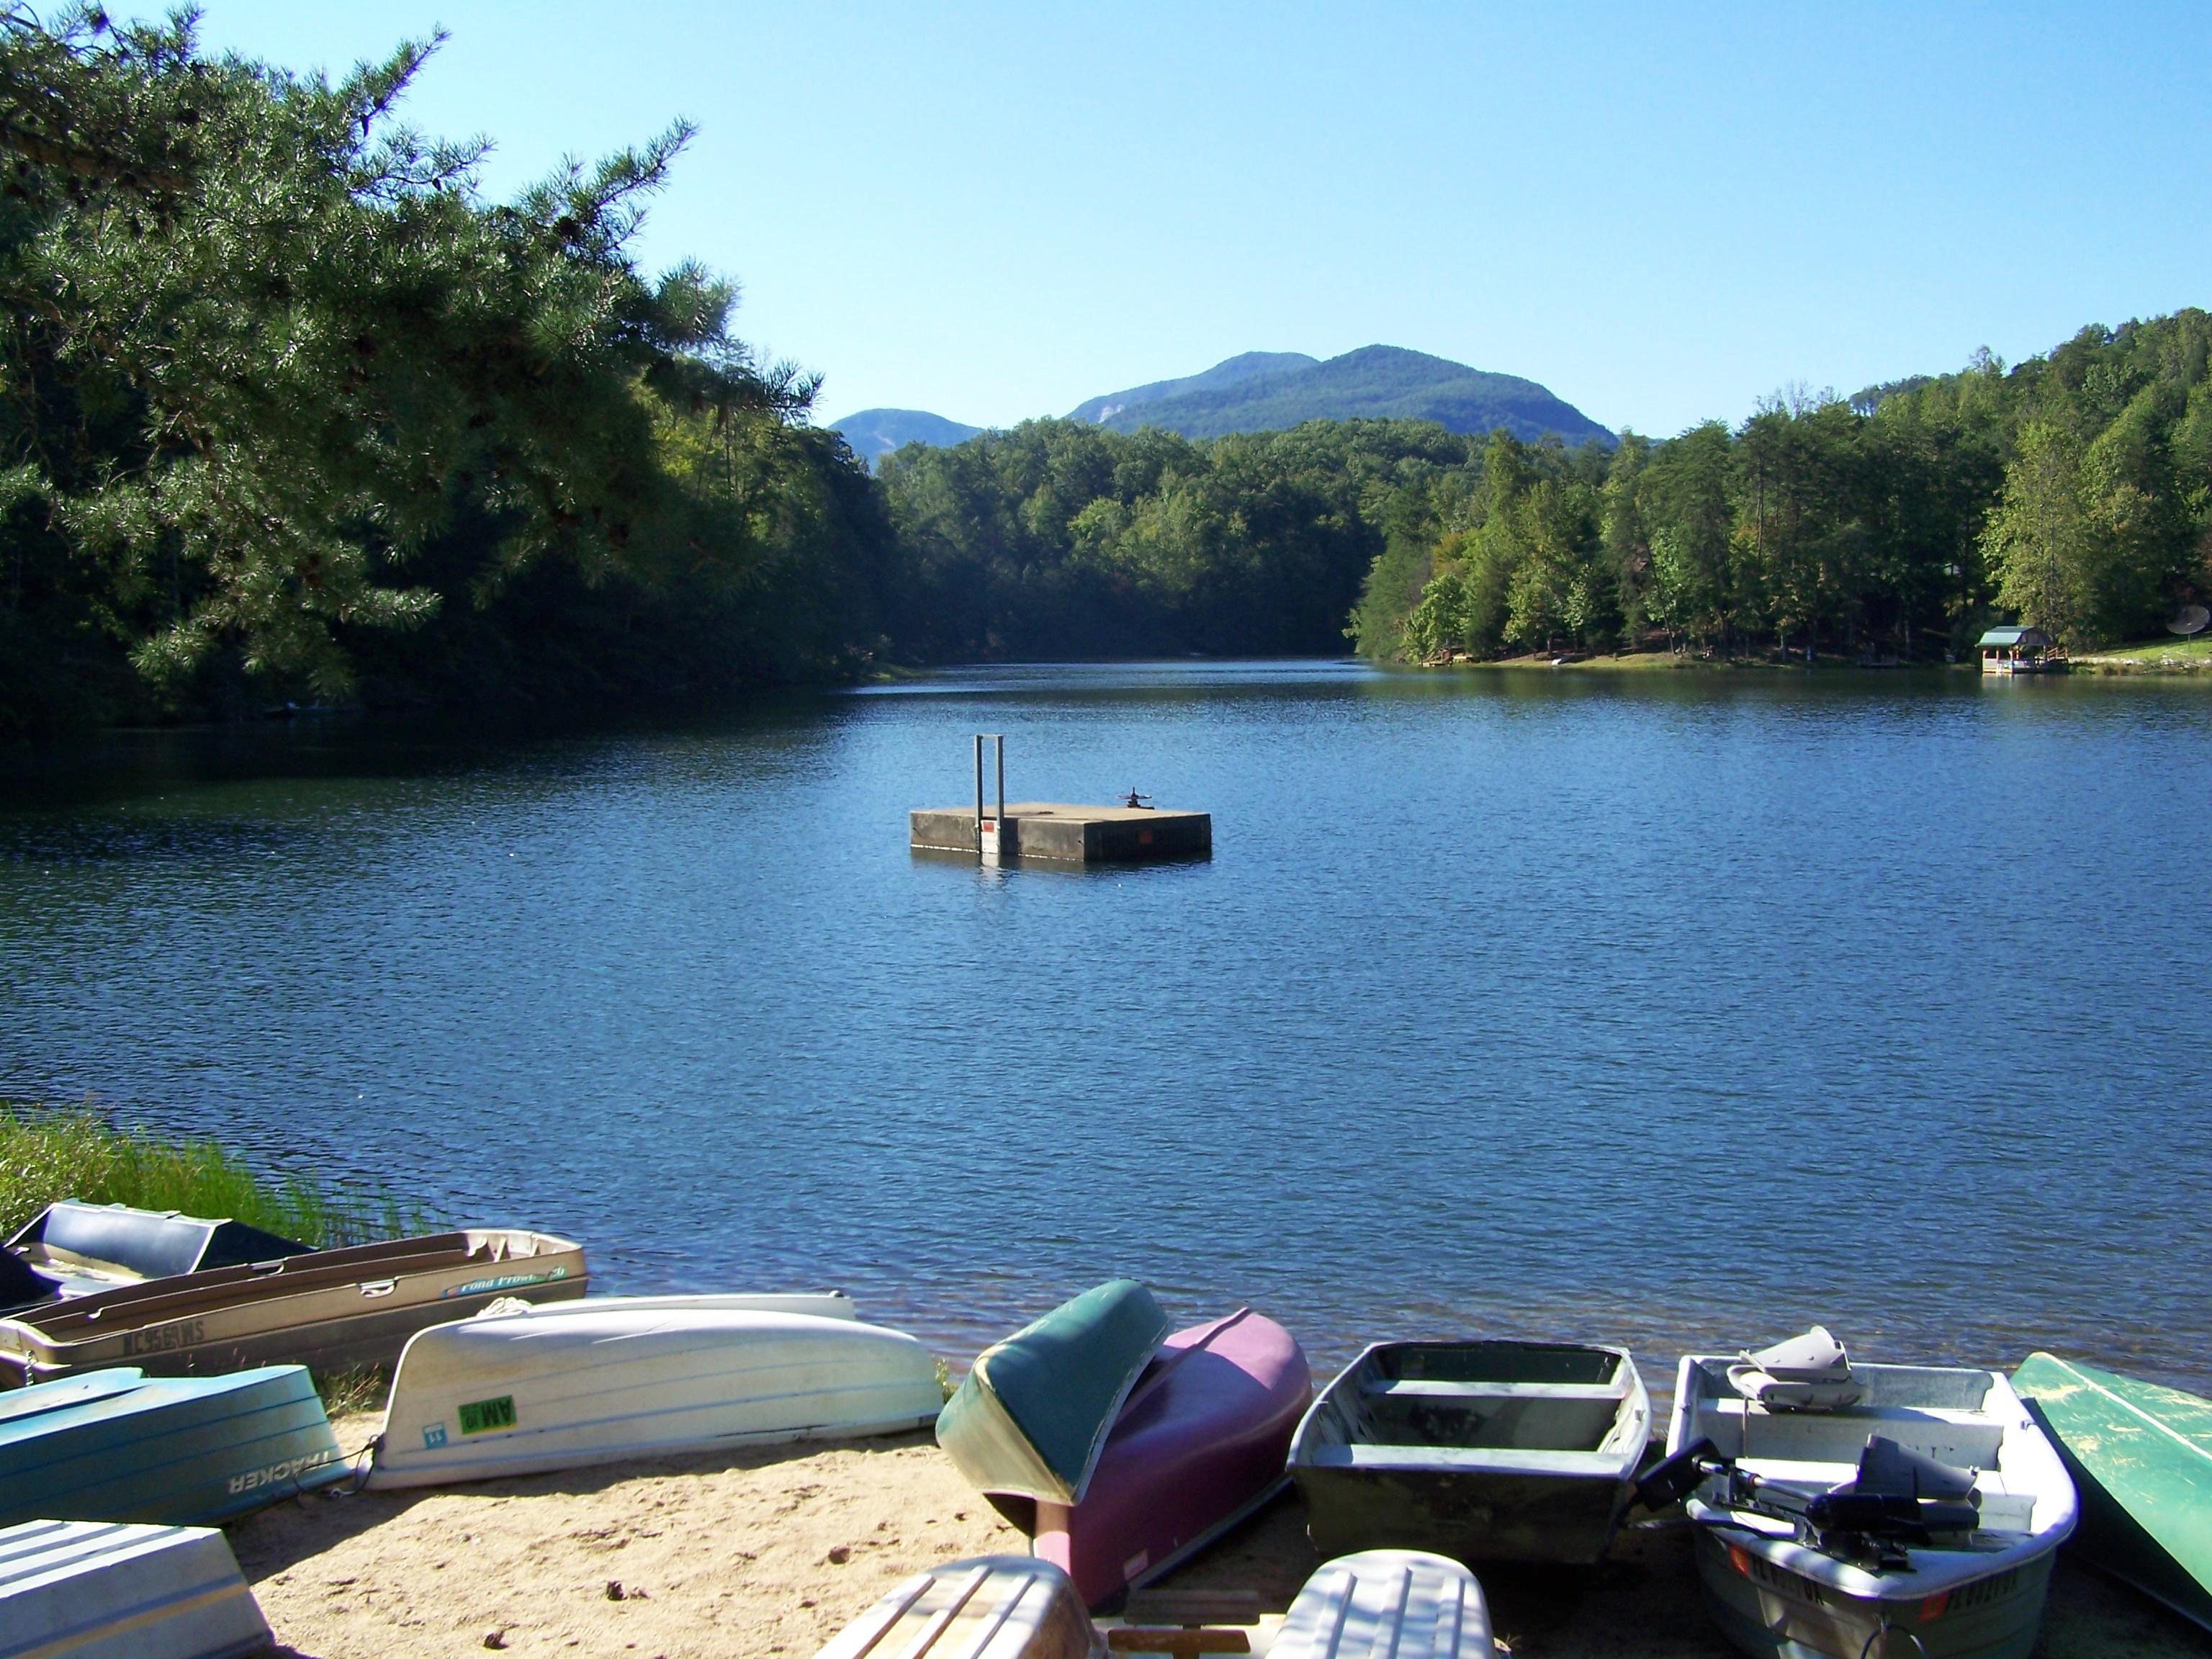 Riverbend at Lake Lure